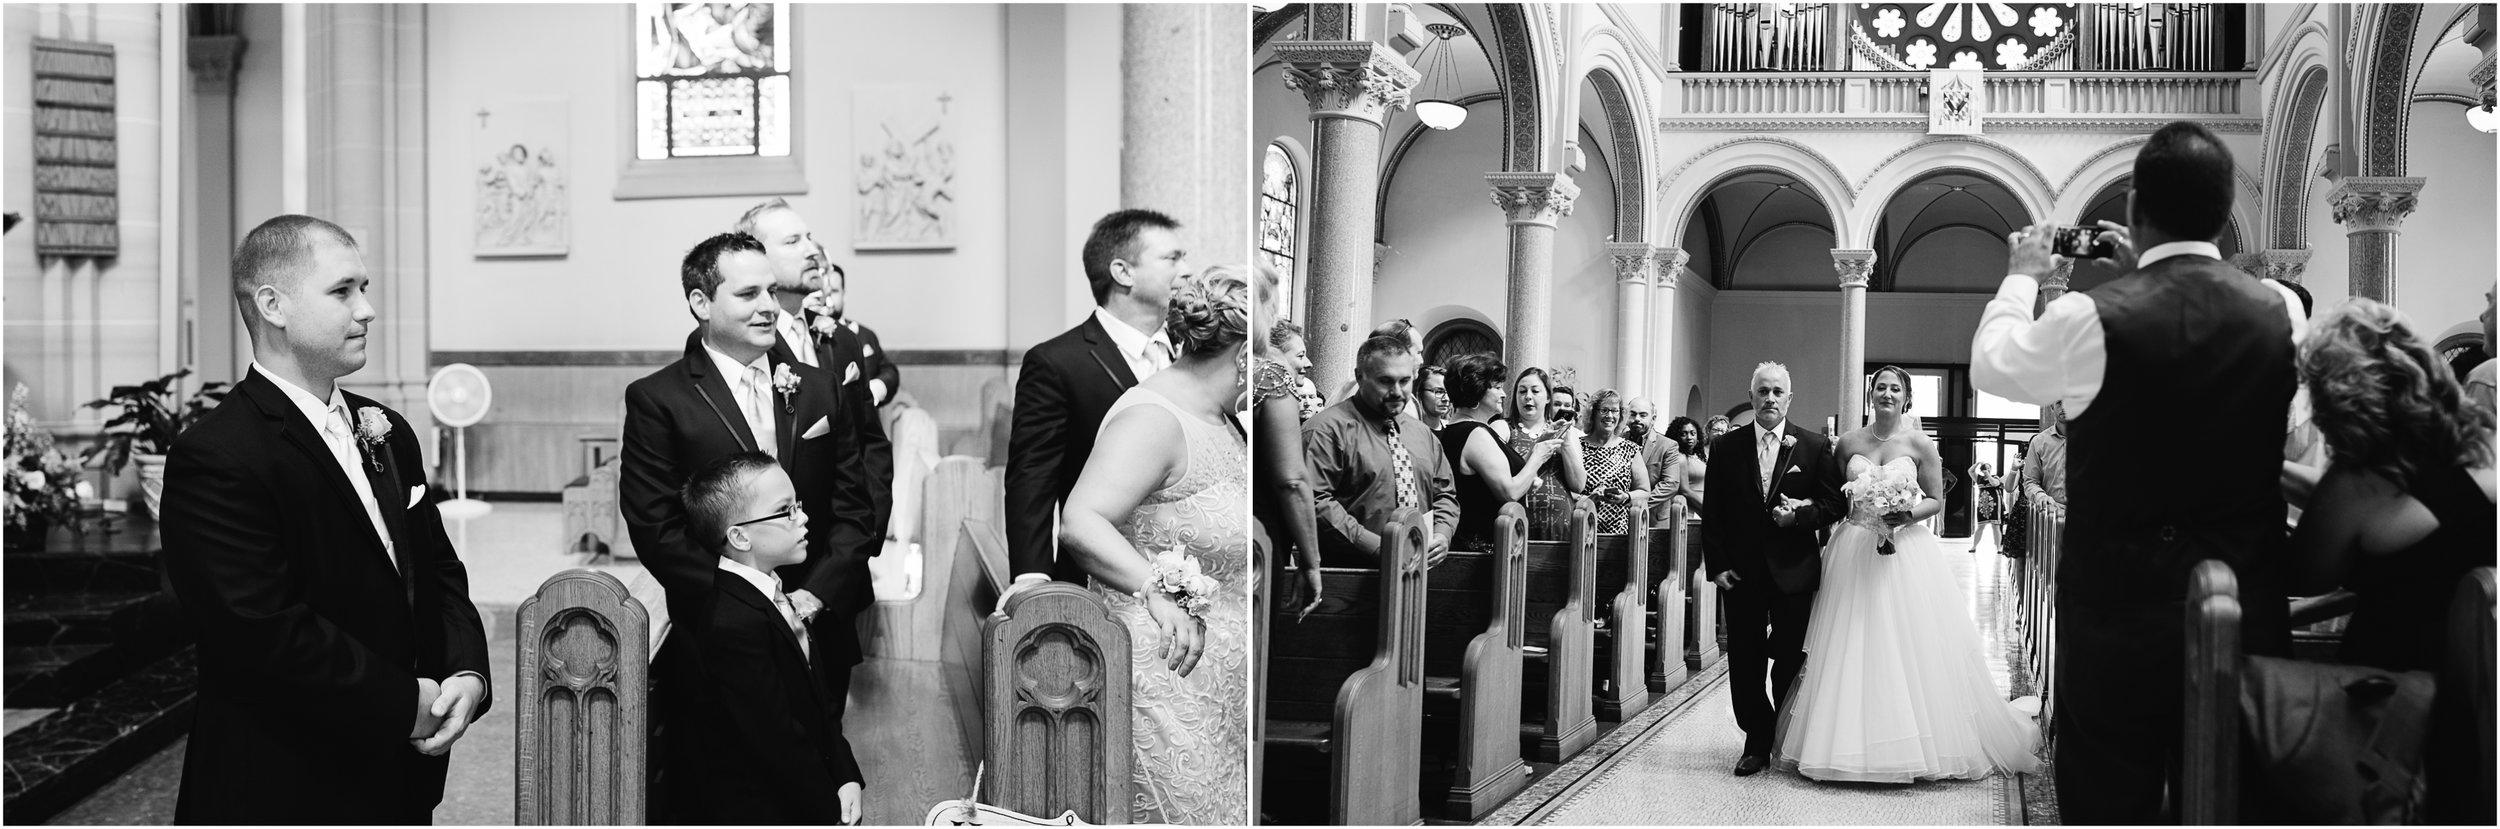 st vincent cathedral wedding latrobe.jpg